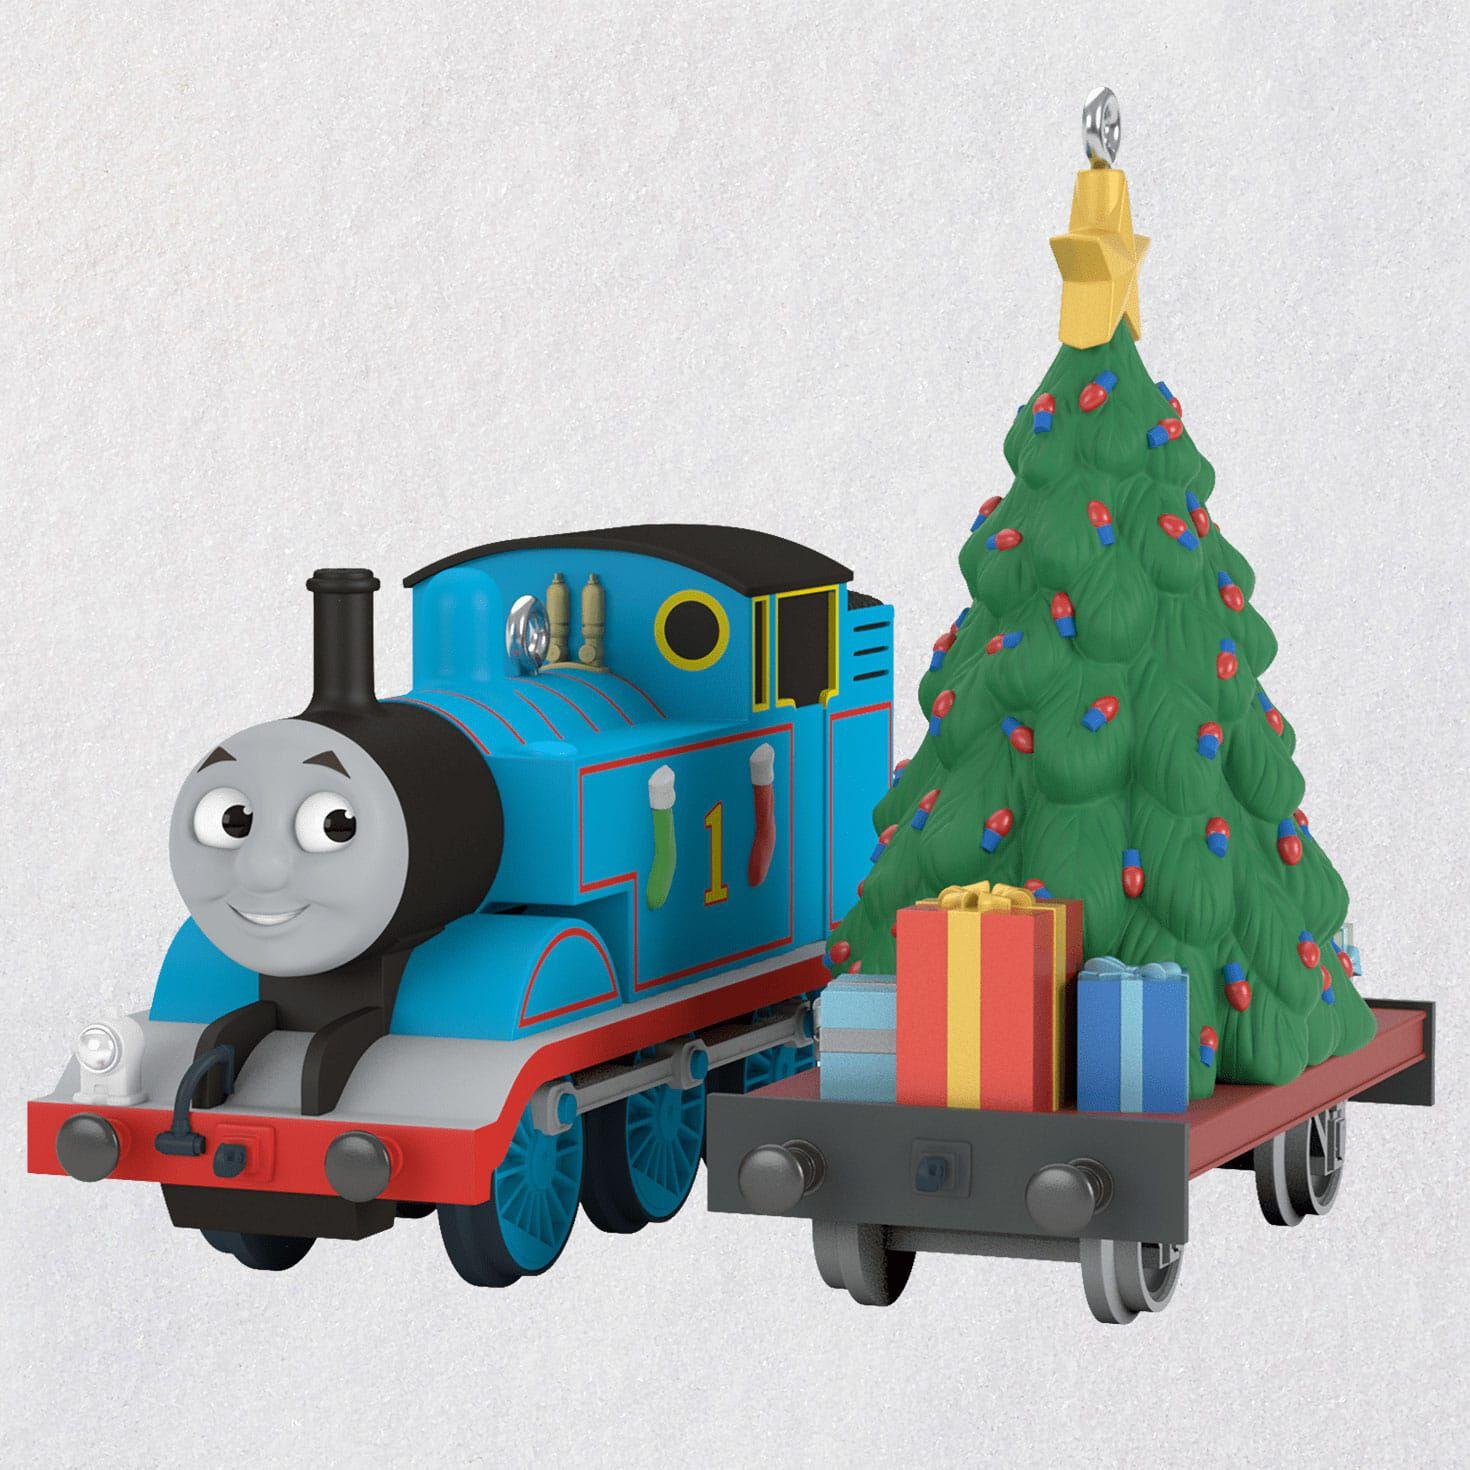 Thomas The Train Christmas Set.Thomas The Tank Engine A Tree For Thomas Ornament Set Of 2